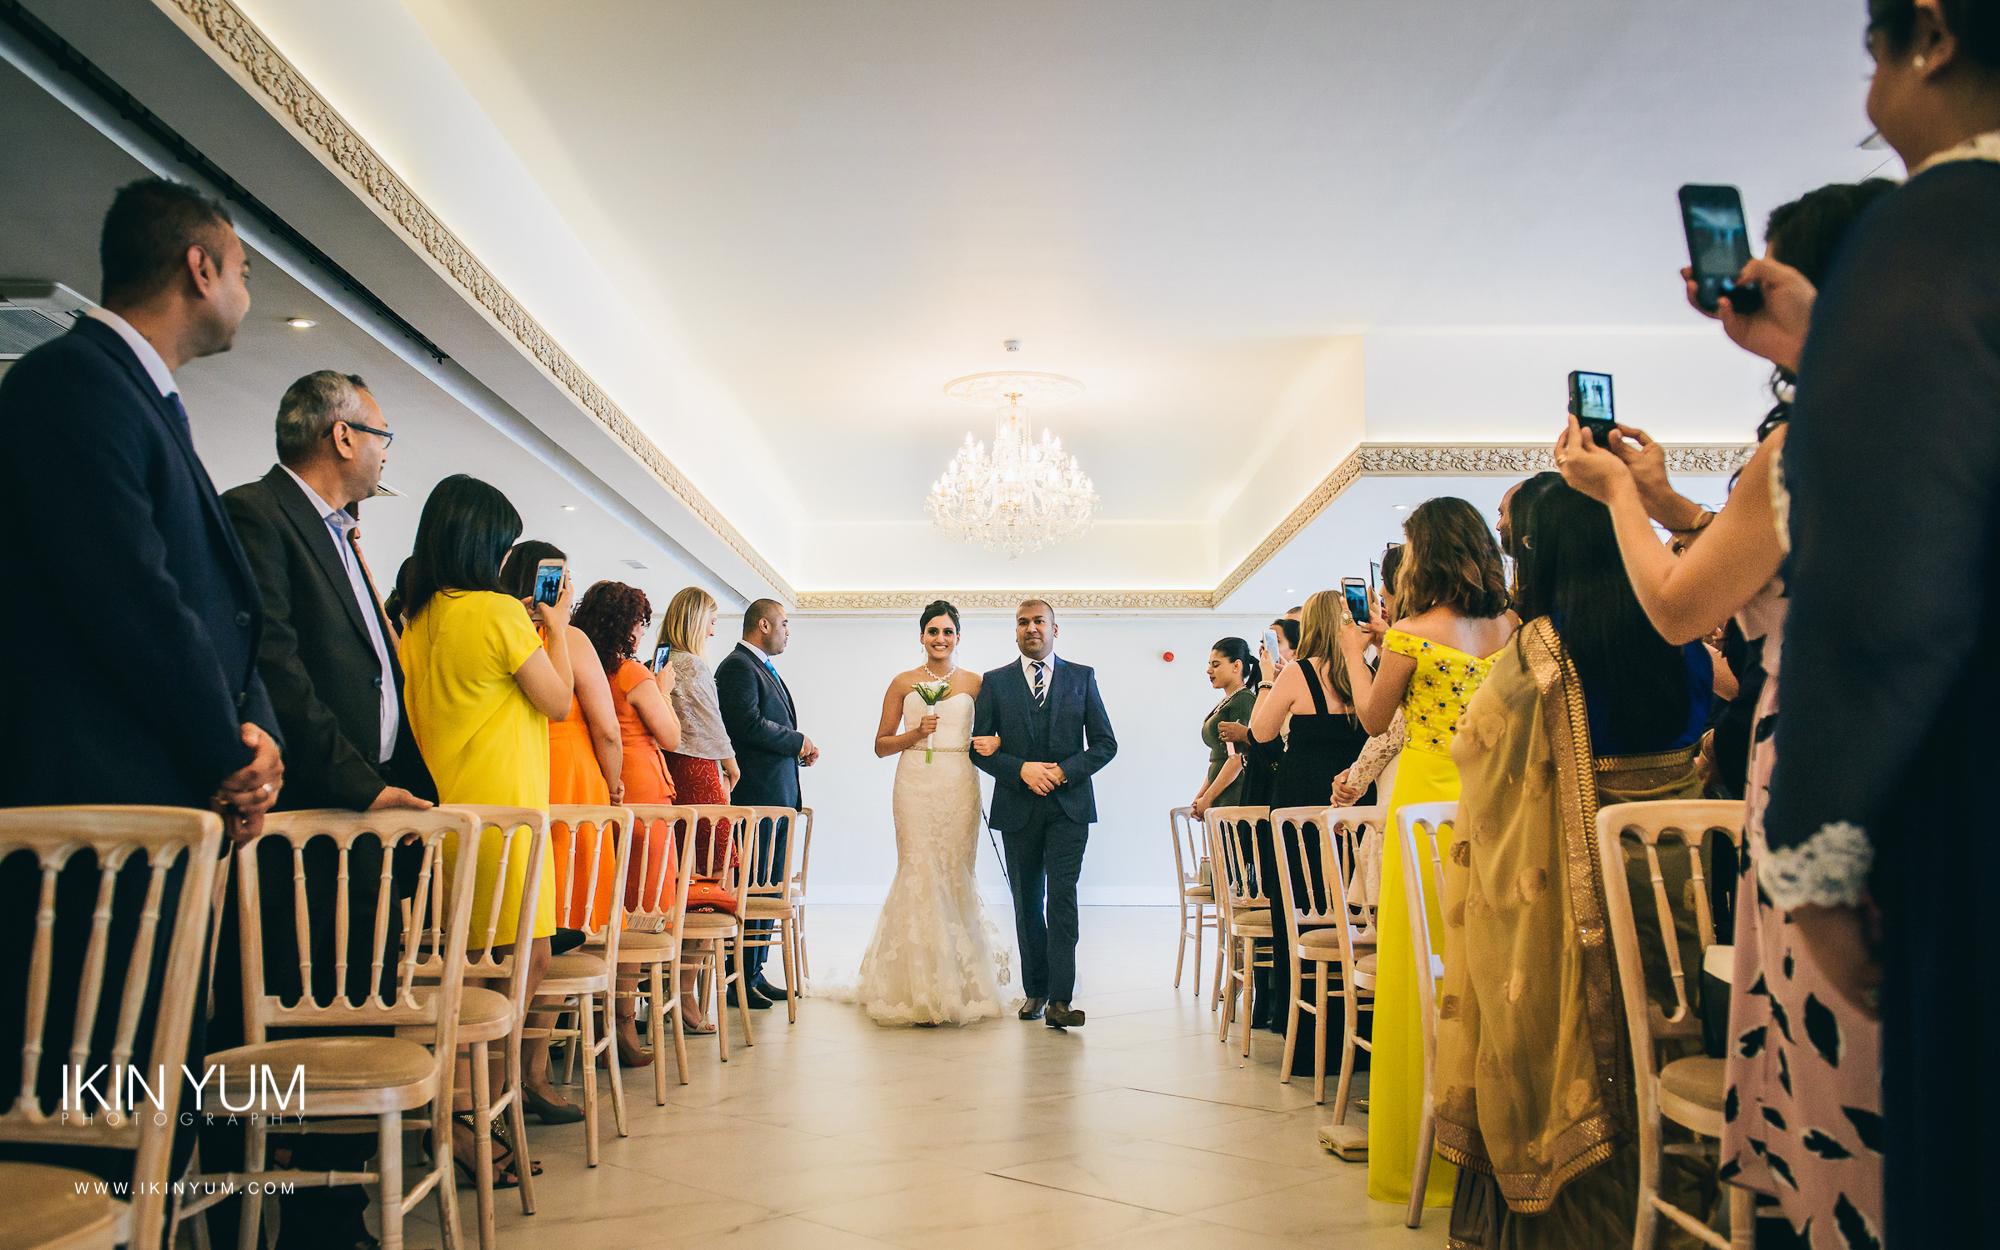 Froyle Park Indian Wedding - Ikin Yum Photography-047.jpg